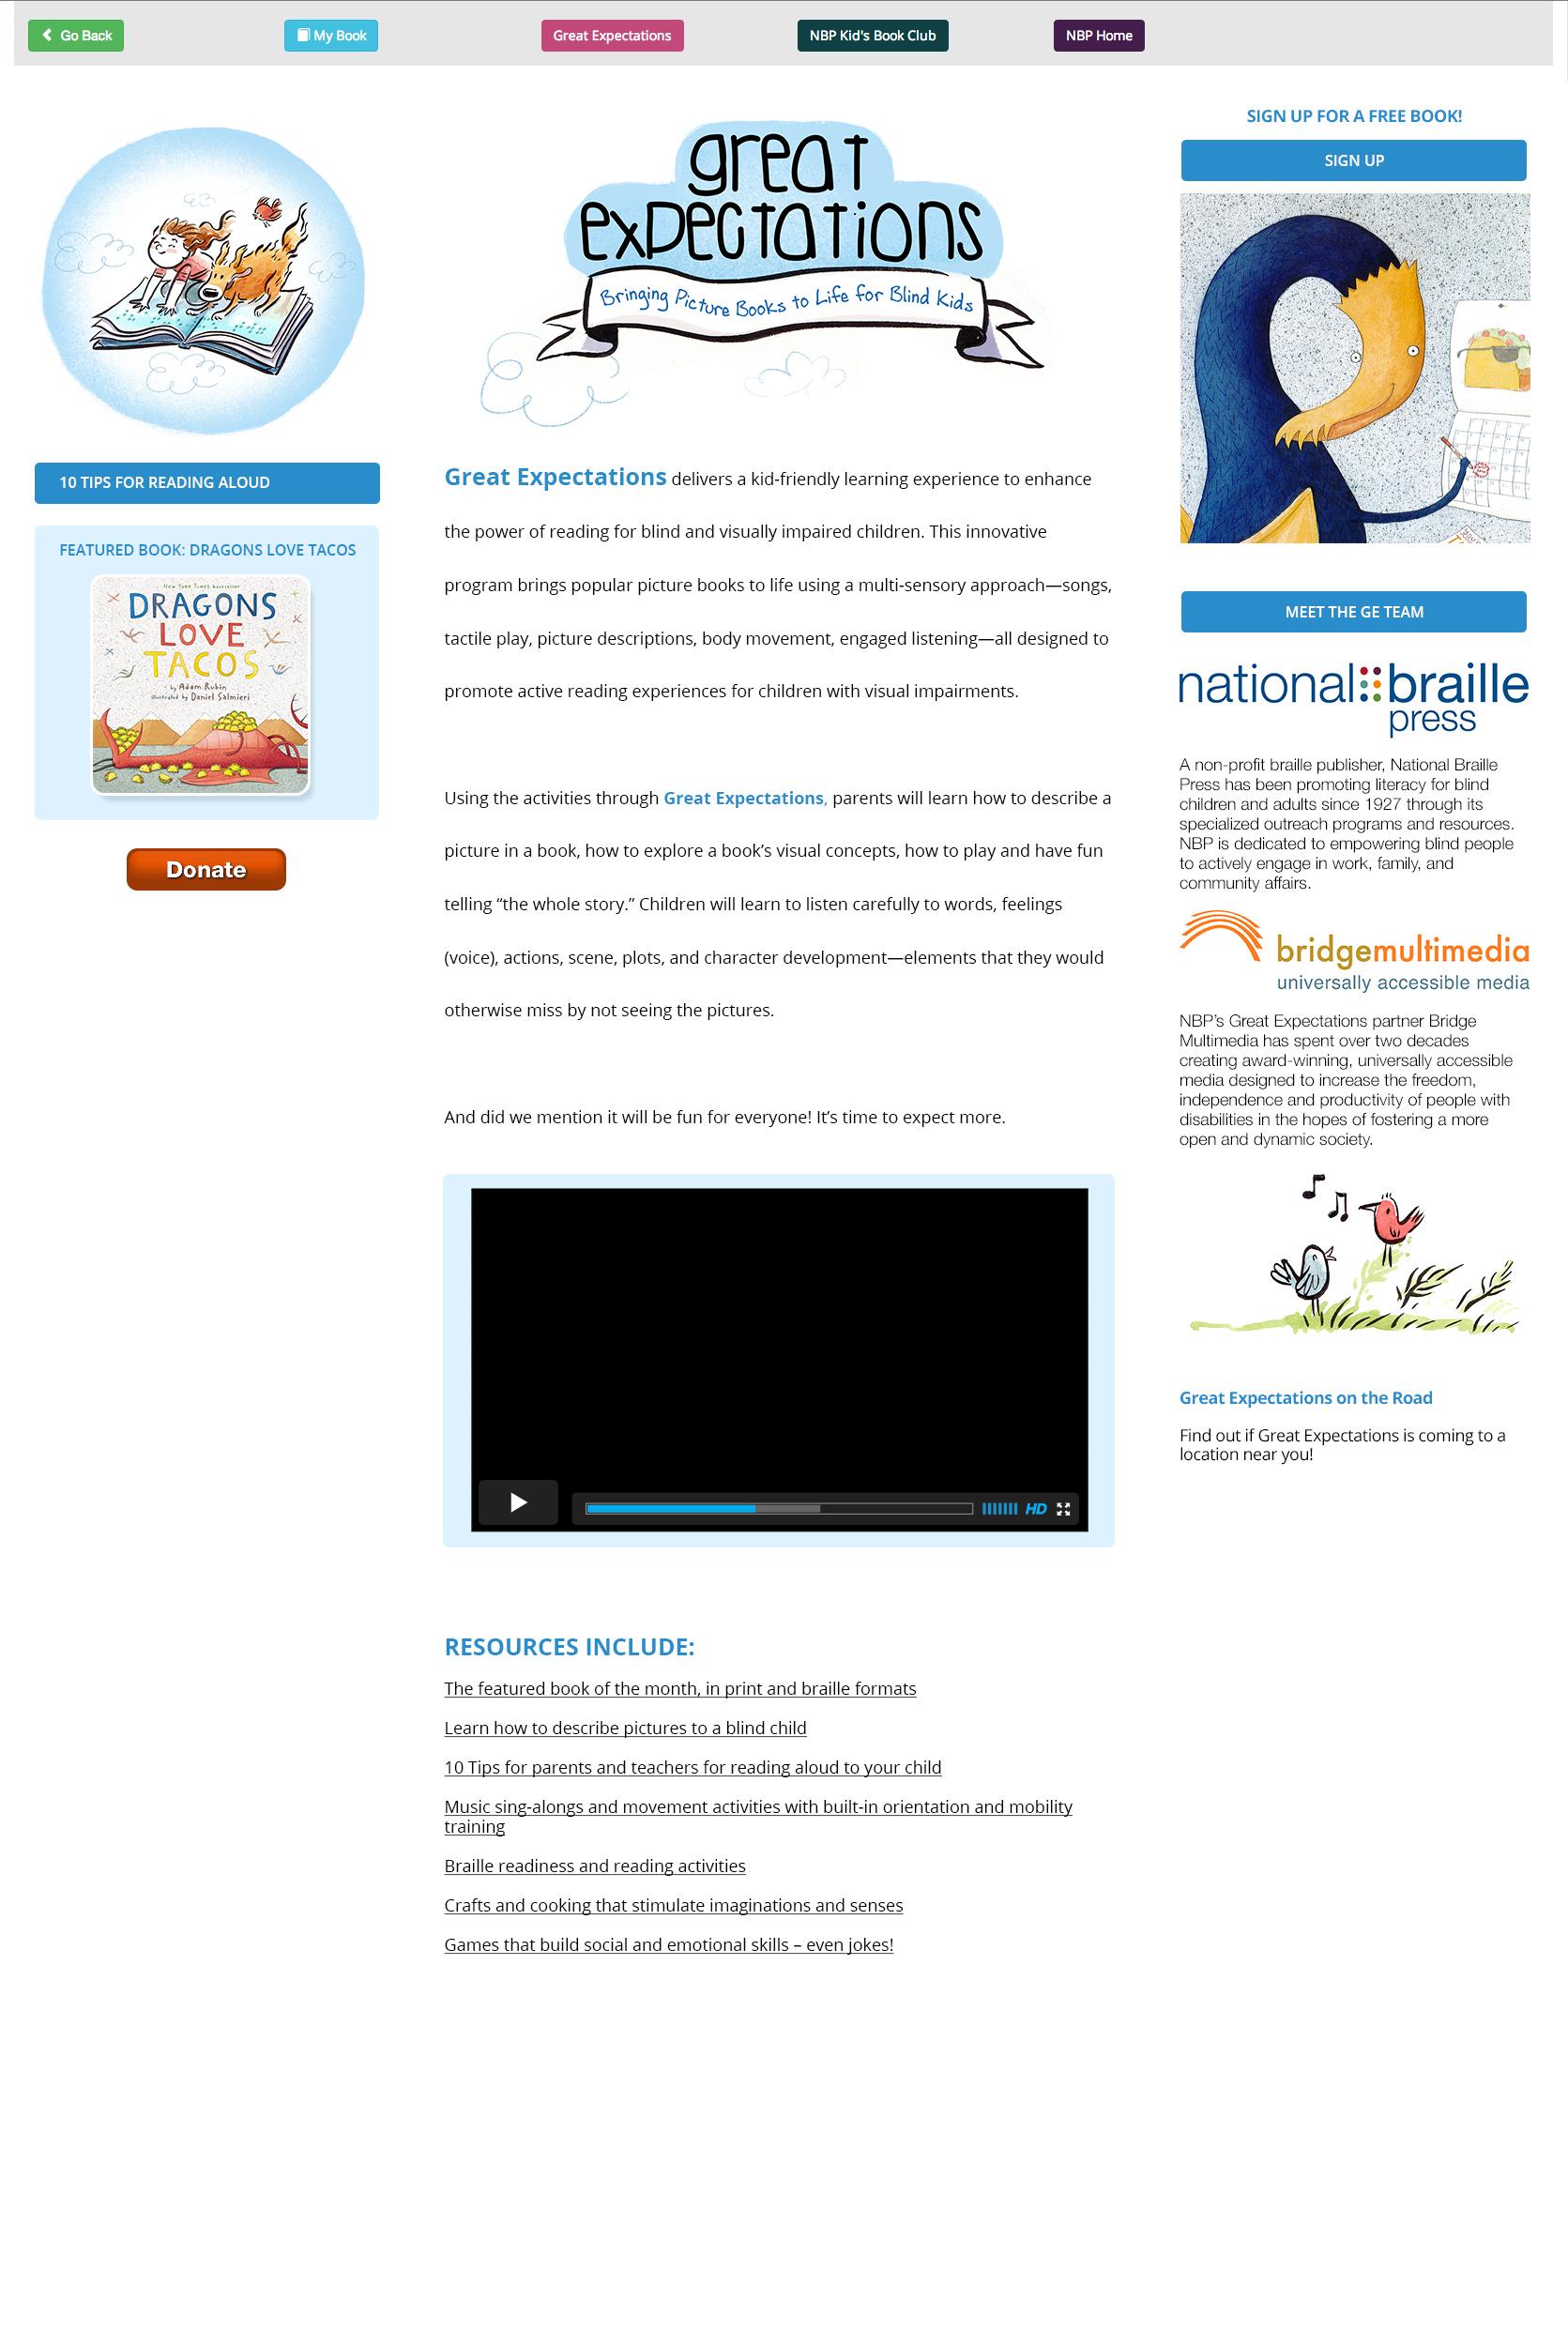 NBP_LandingPageTemplate (1).jpg